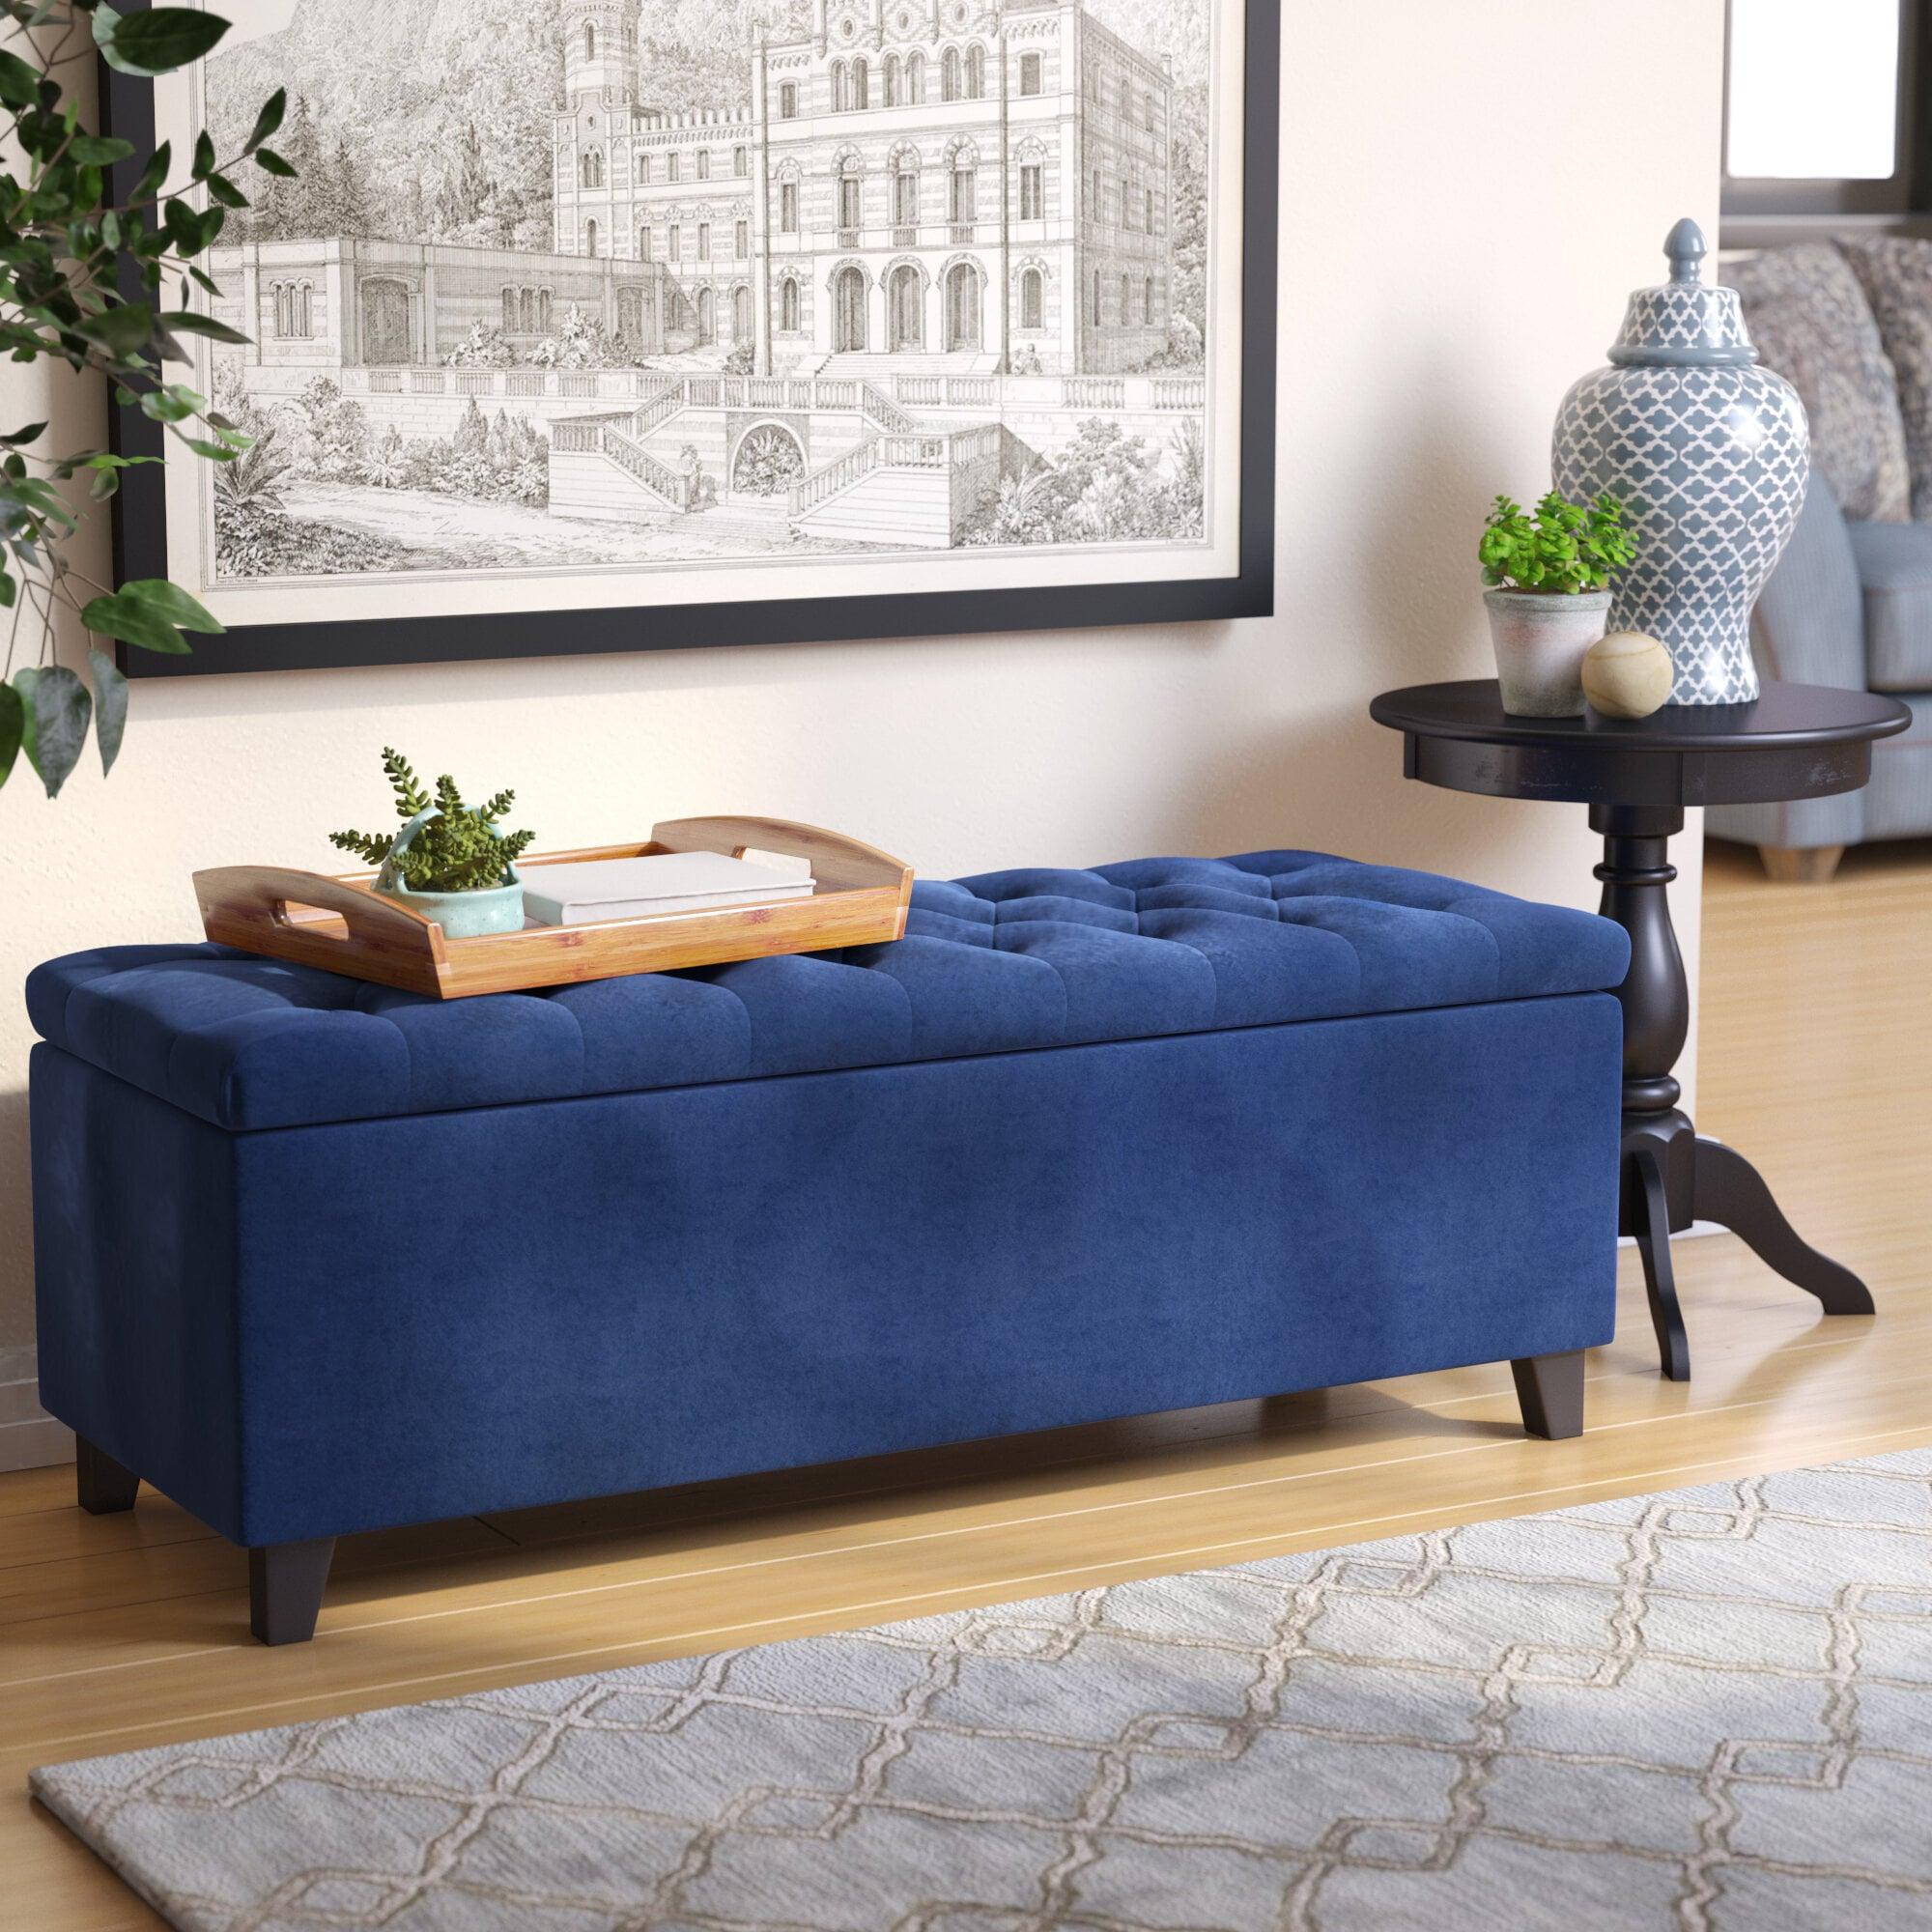 Best Living-Room Furniture From Wayfair  POPSUGAR Home